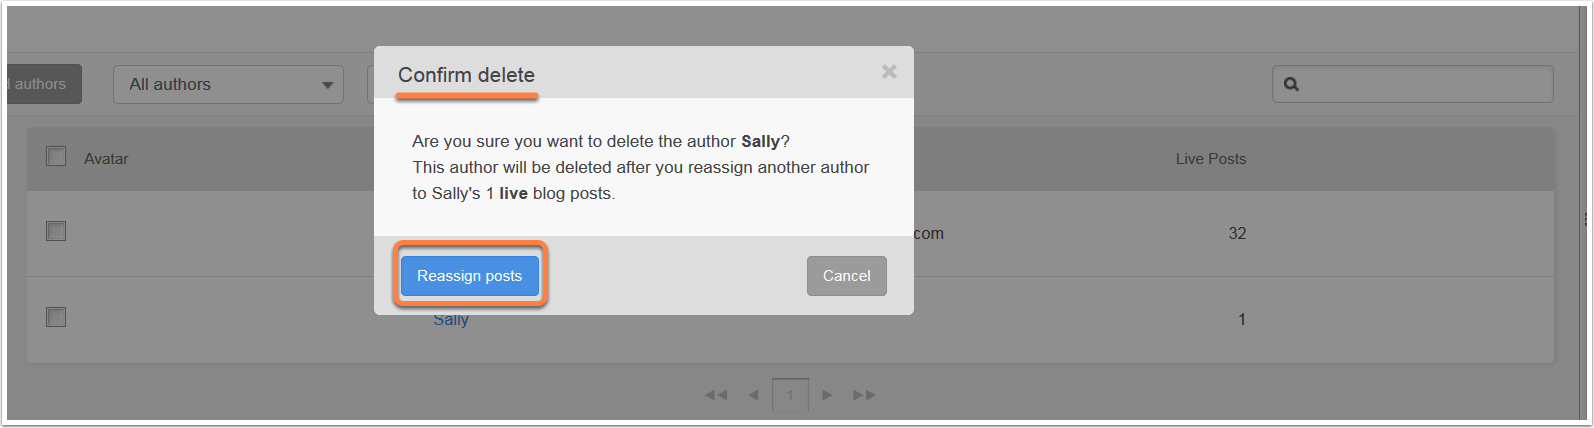 confirm-delete-author.png